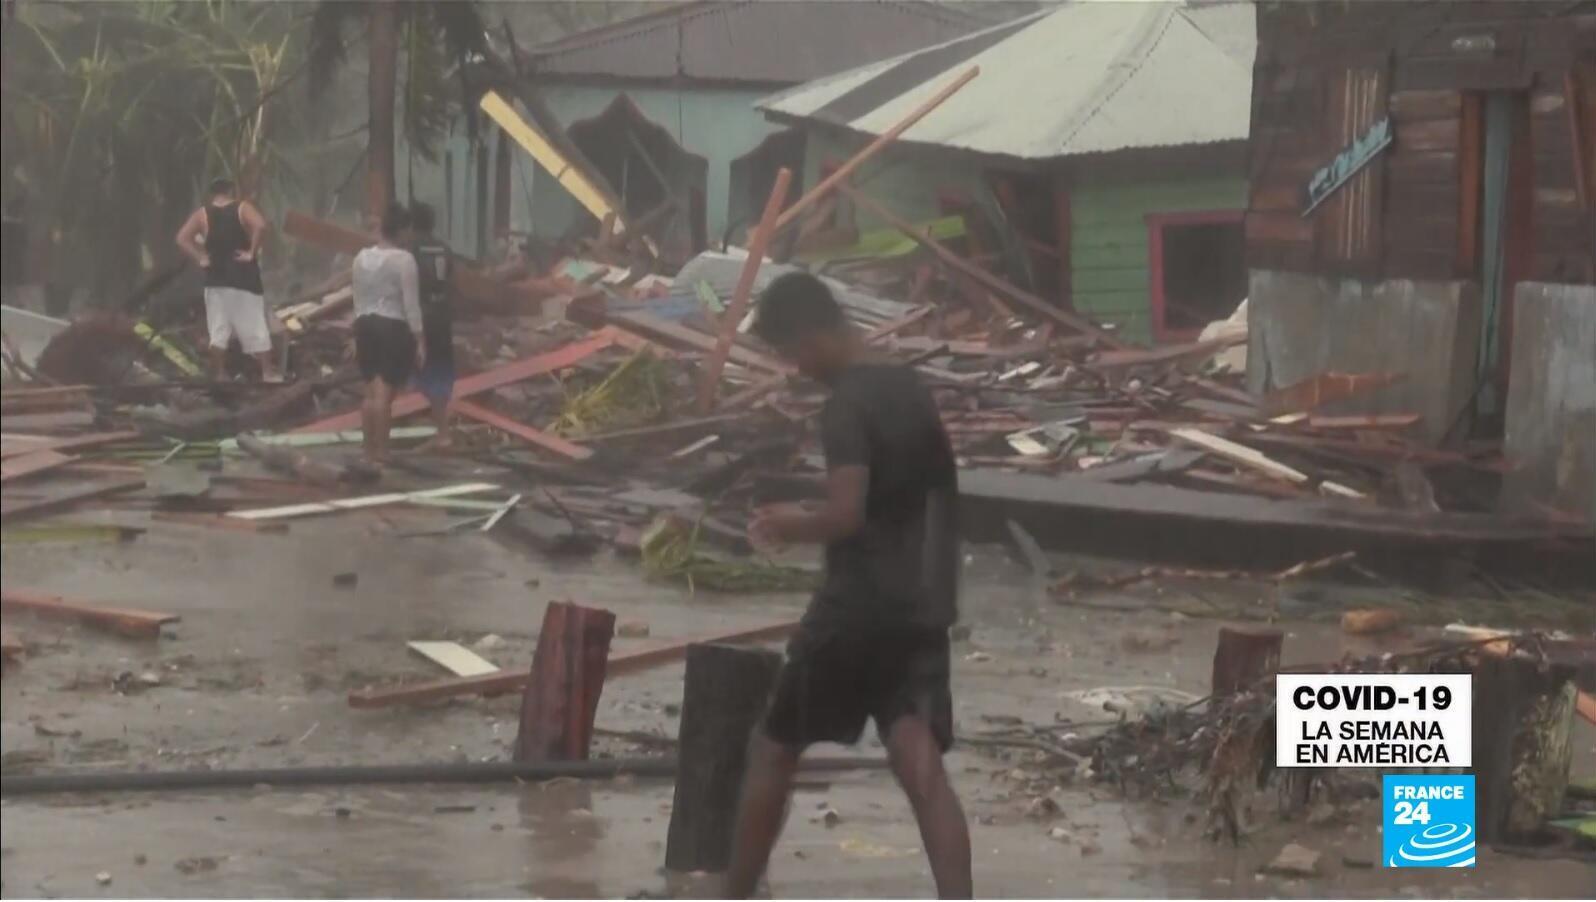 Covid-19 La Semana en América - doble emergencia Centroamérica